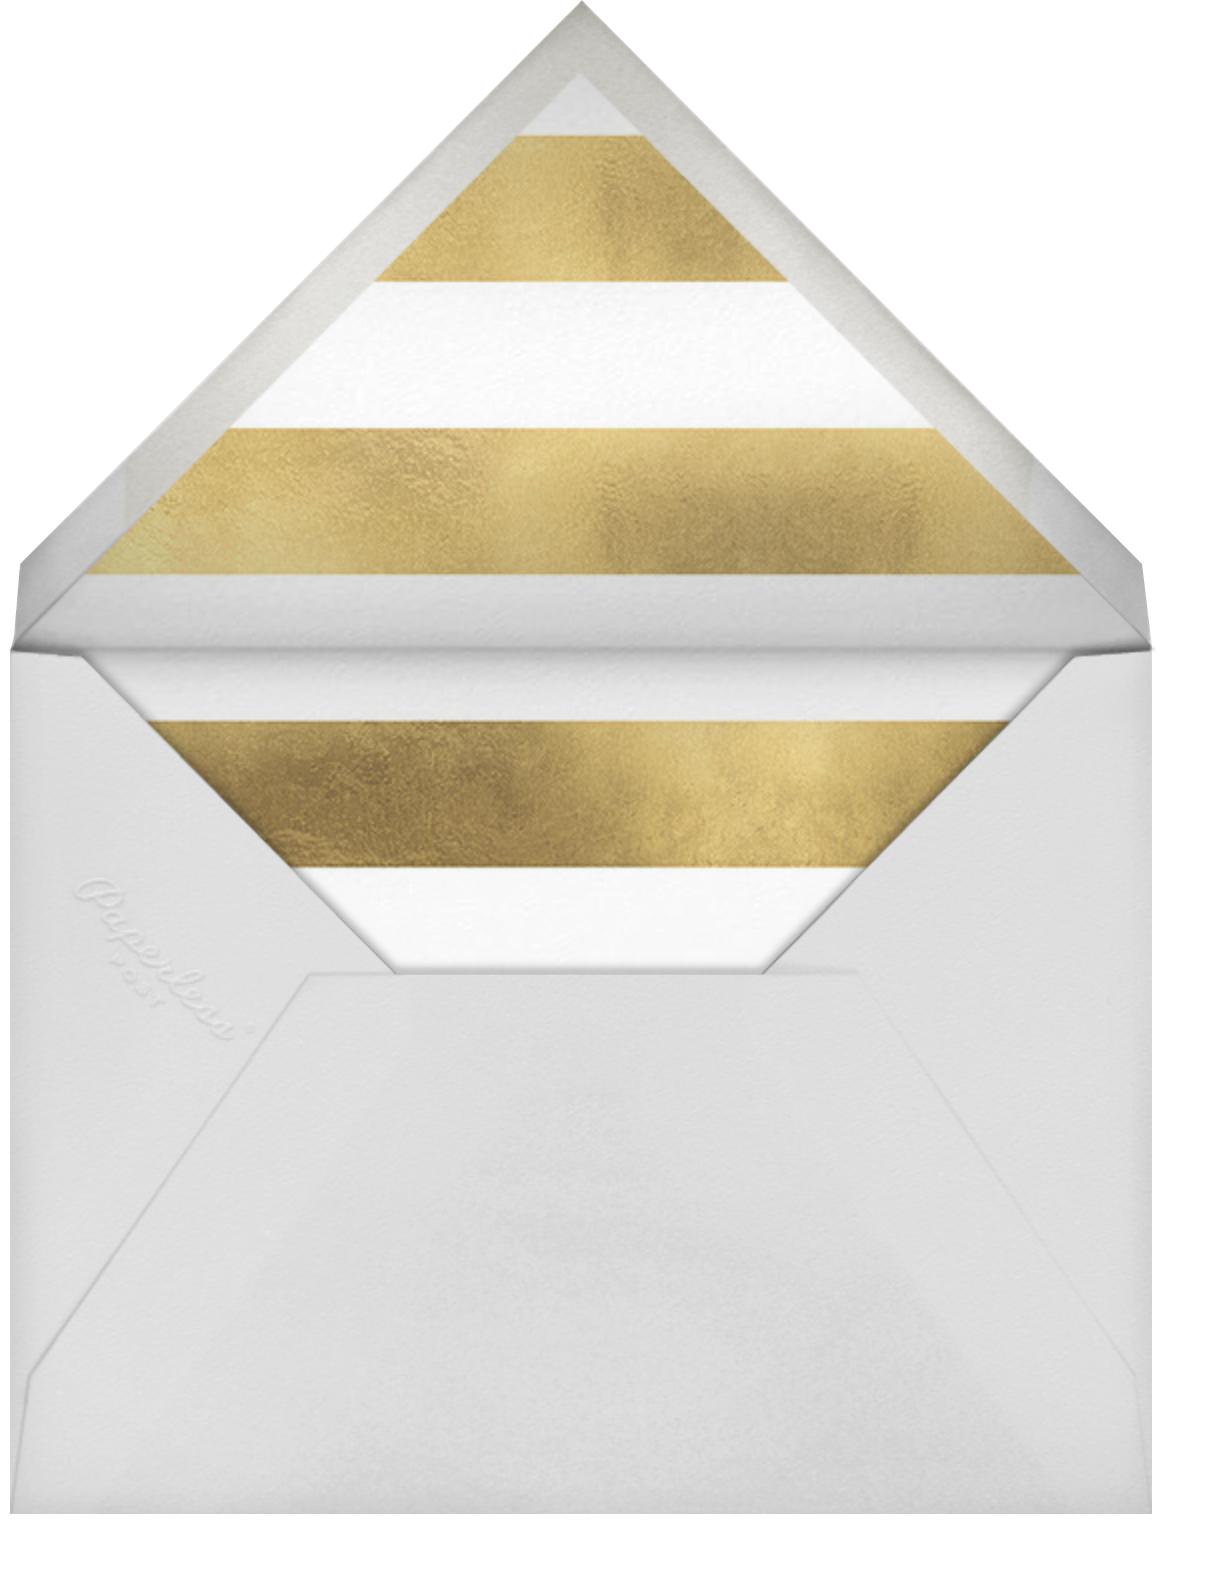 Big Dot Engagement (Photo) - Gold - Sugar Paper - Envelope